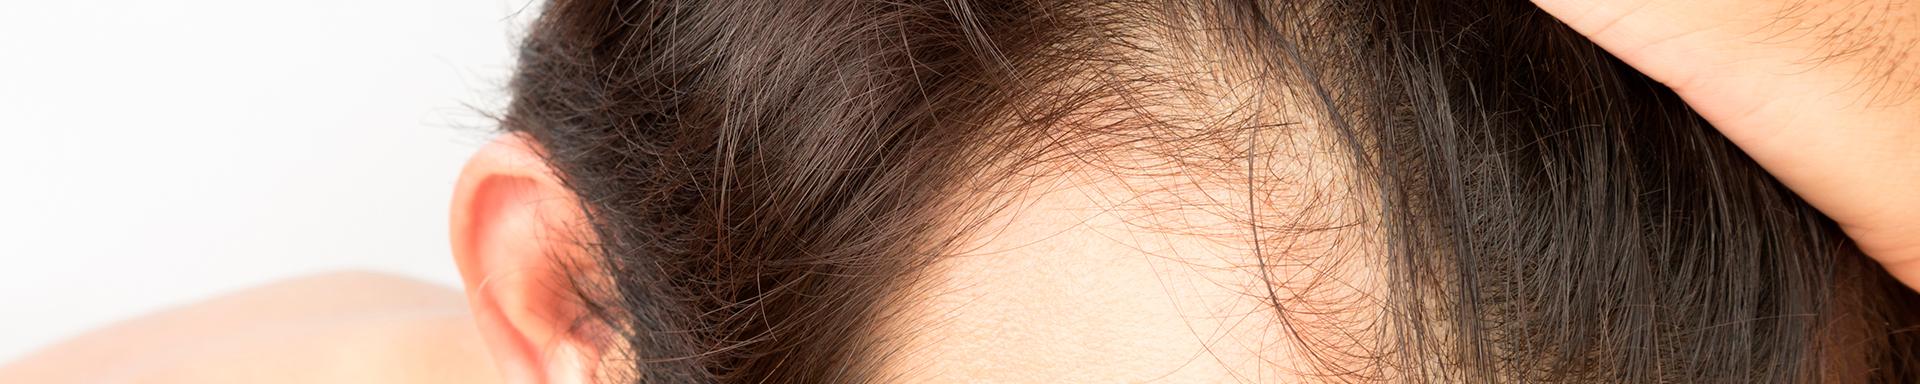 Caida-cabello-Trasplante-Capilar-barcelona-dermatologo-Caiguda-cabell-Trasplantament-capil·lar-dermatoleg-clinica-teknon